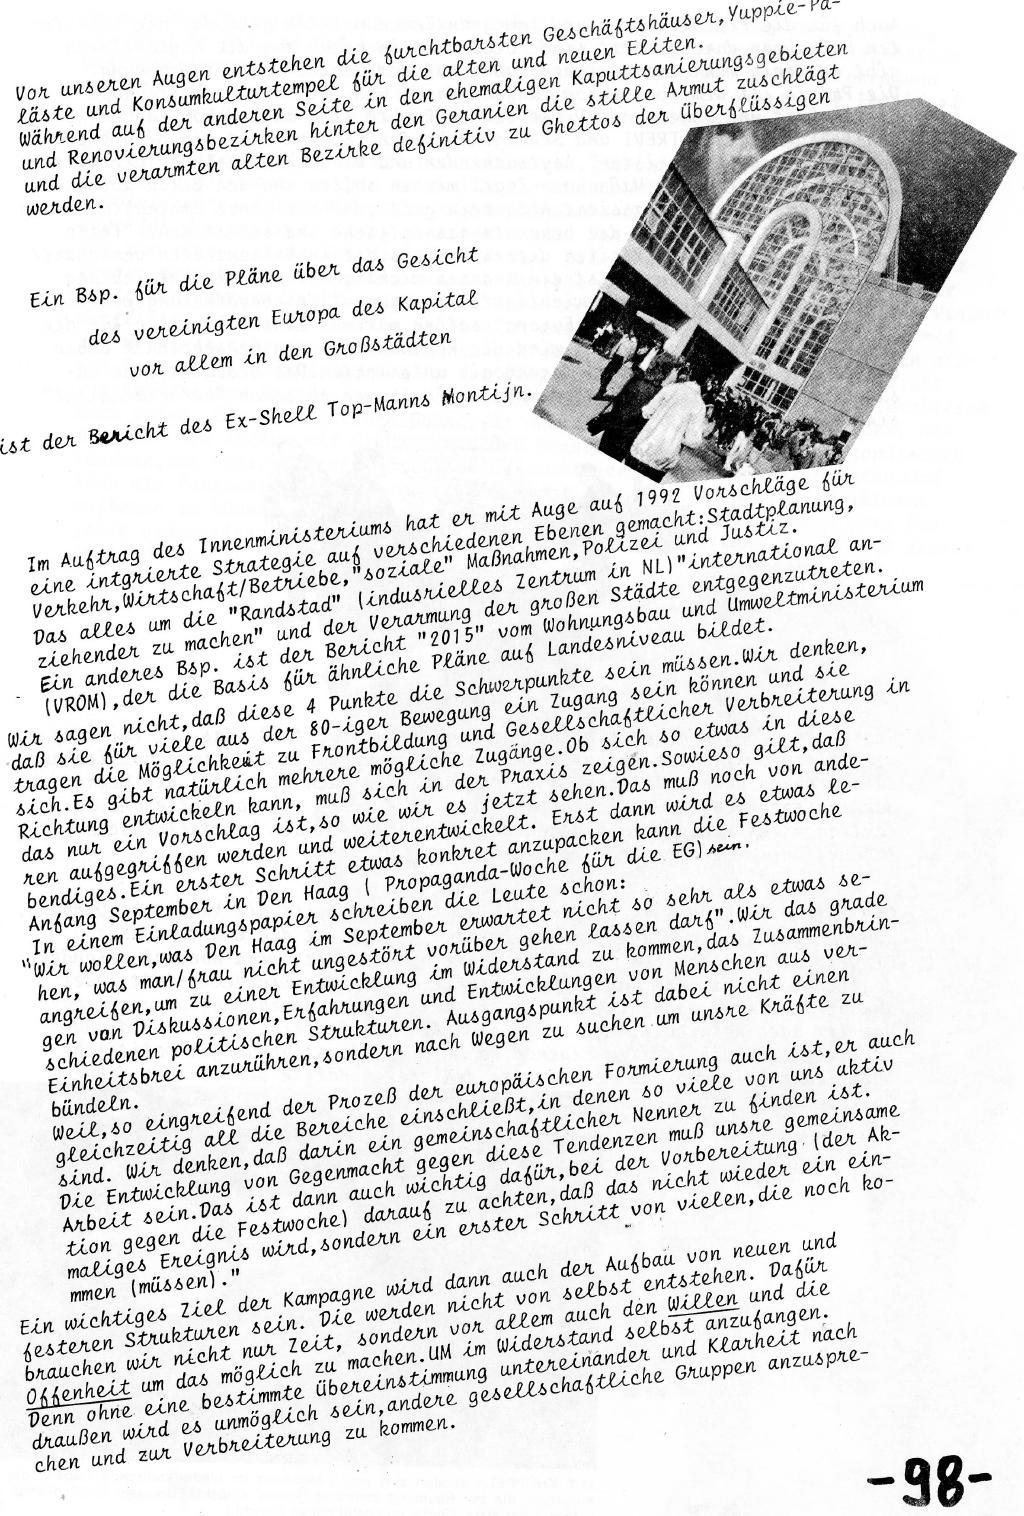 Belgien_Doku_Besetzung_EG_Kommission_1989_100